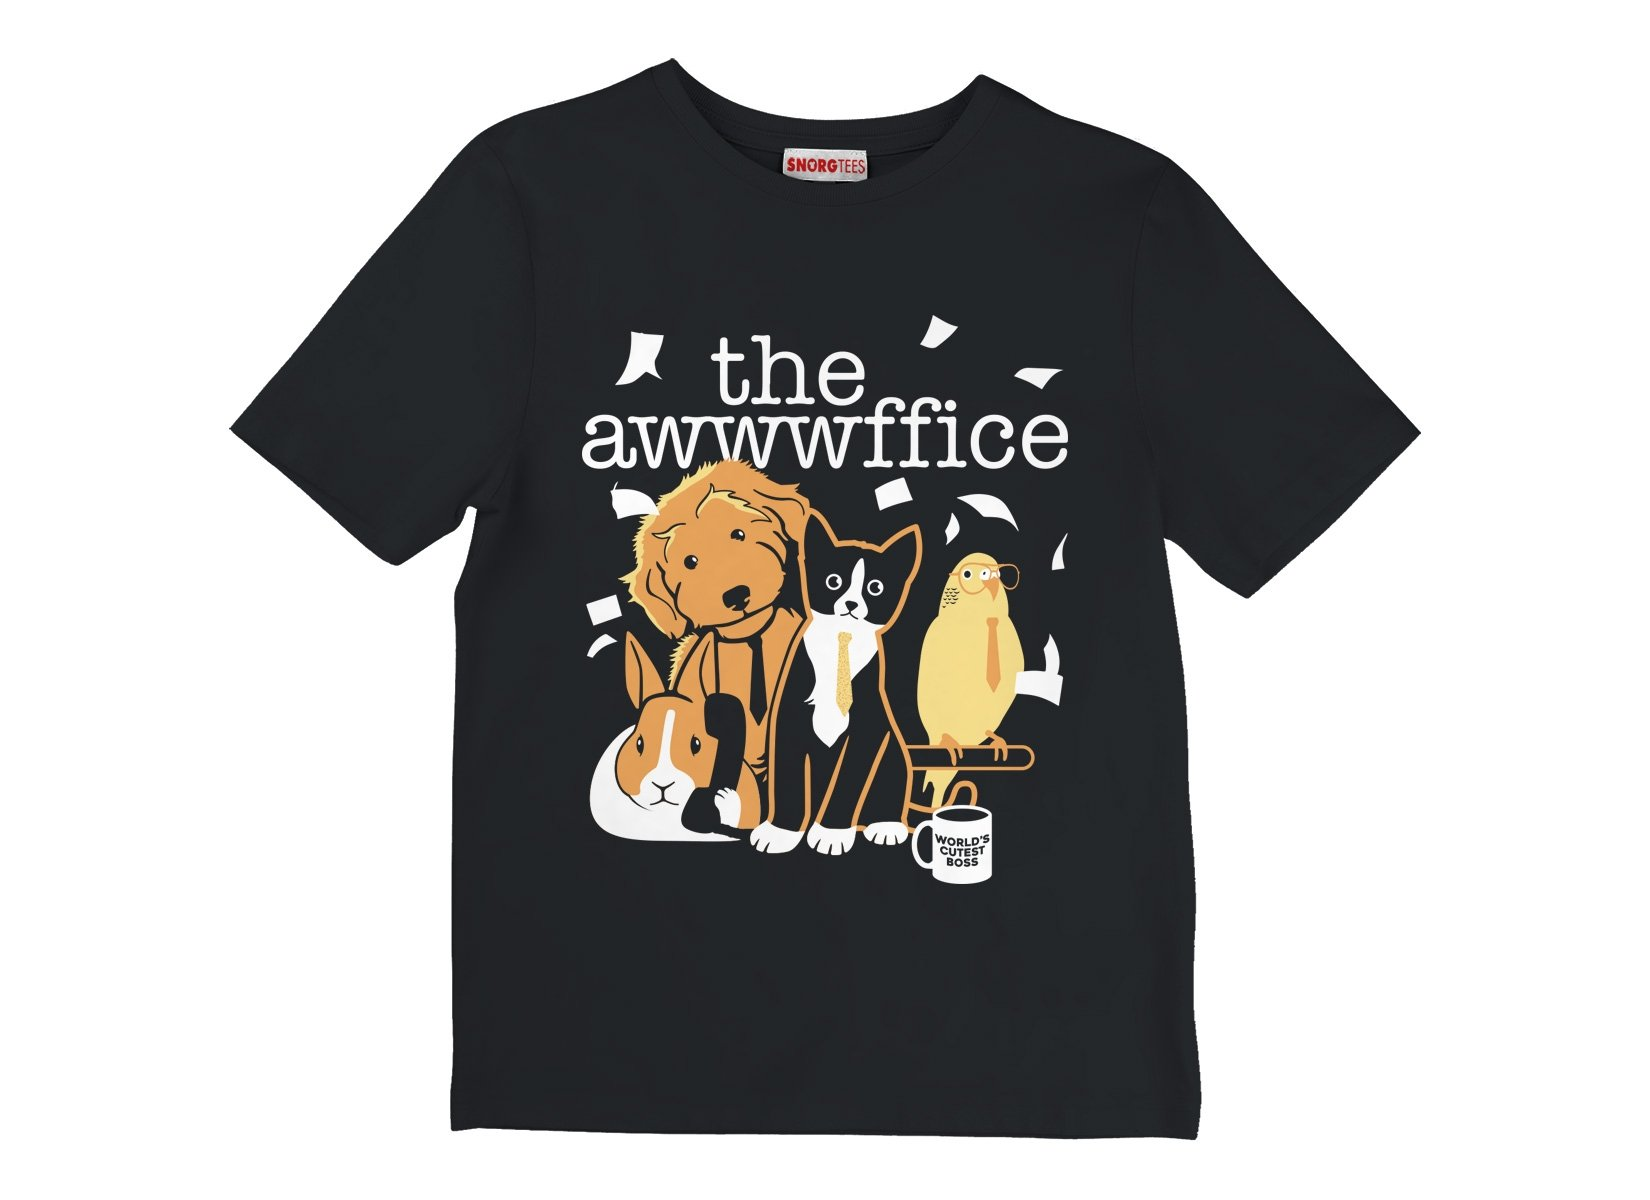 The Awwwffice on Kids T-Shirt